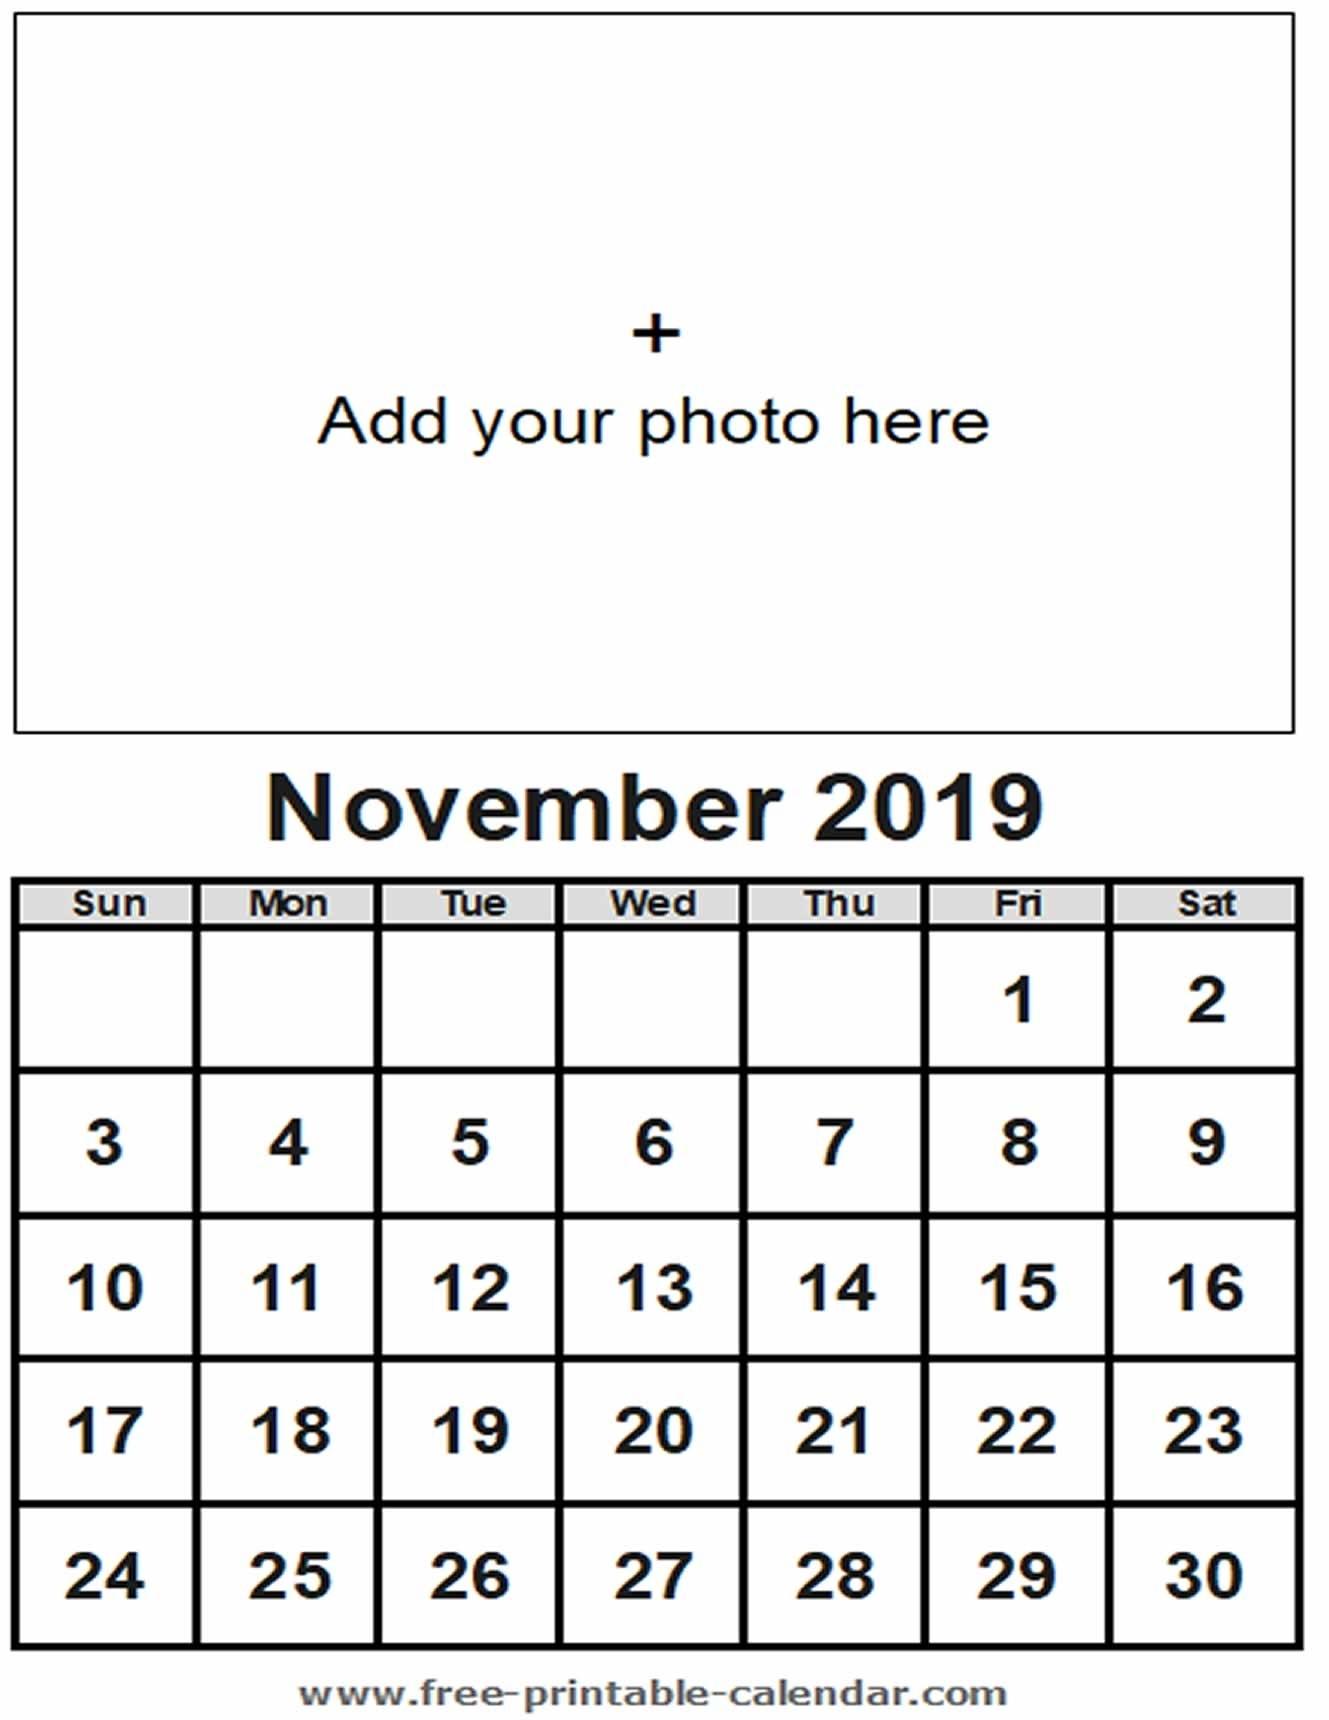 November Calendar 2019 - Free-Printable-Calendar